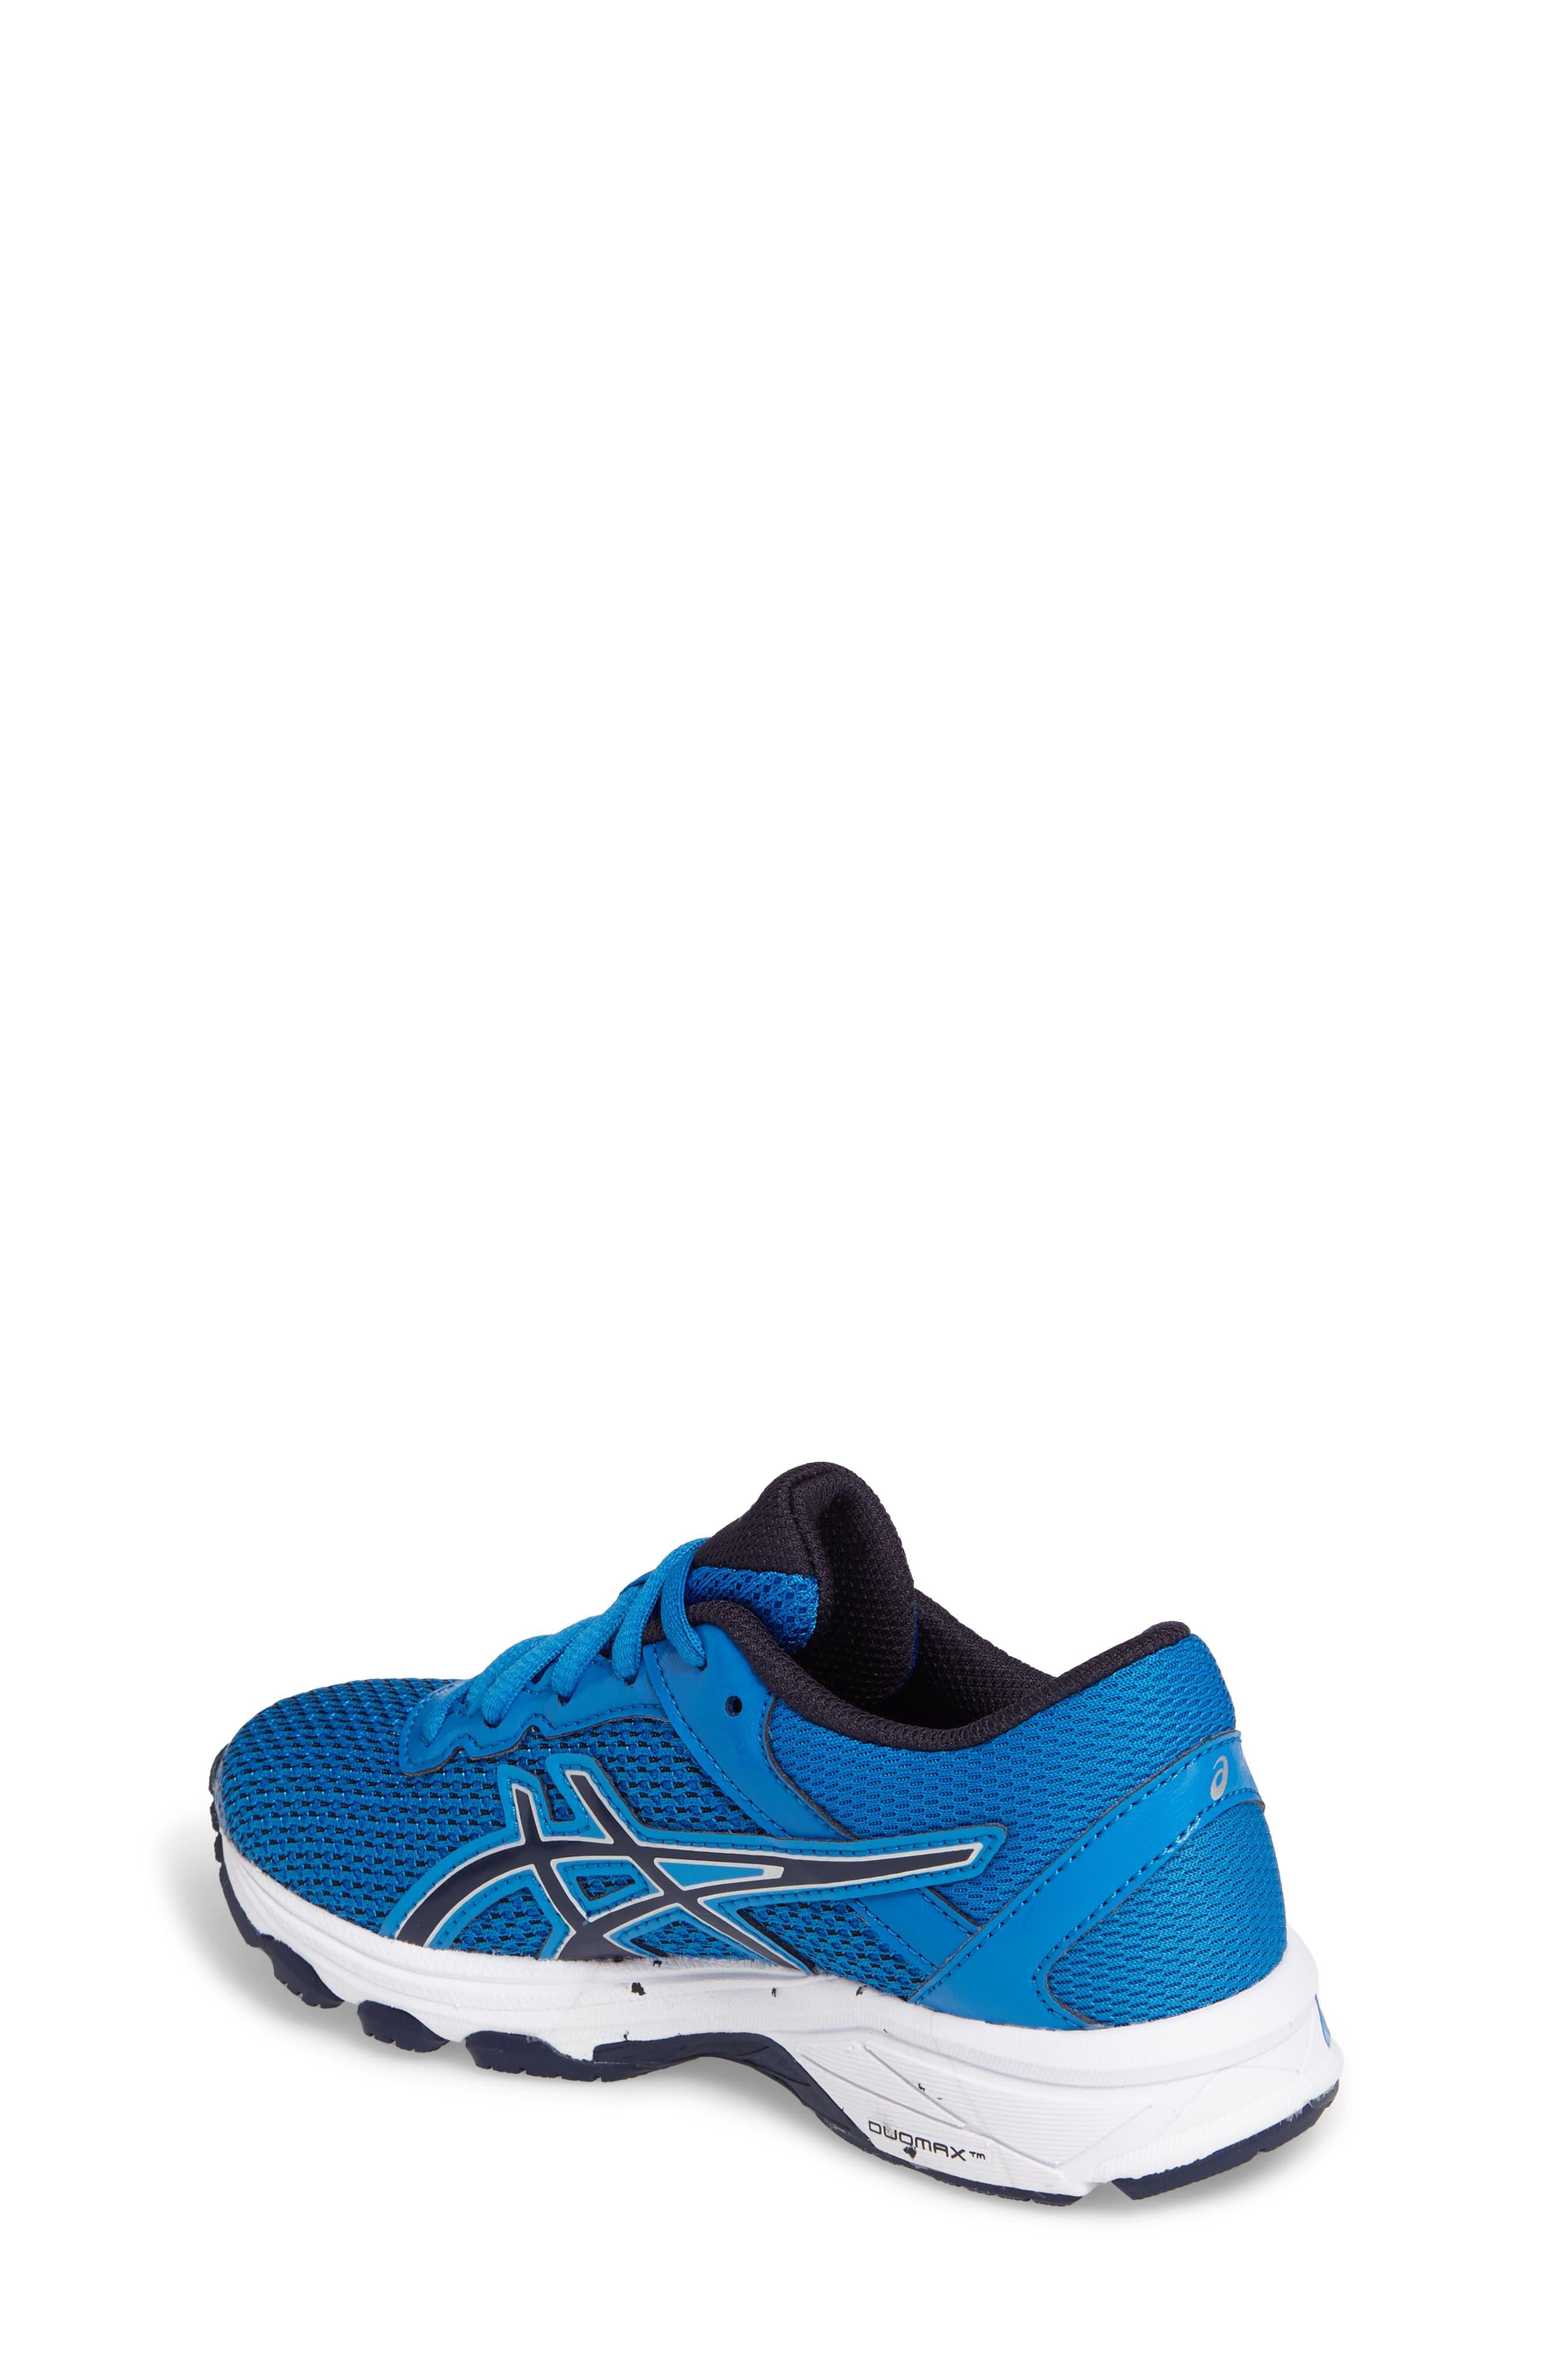 Asics GT-1000<sup>™</sup> 6 GS Sneaker,                             Alternate thumbnail 2, color,                             Blue/ Peacock